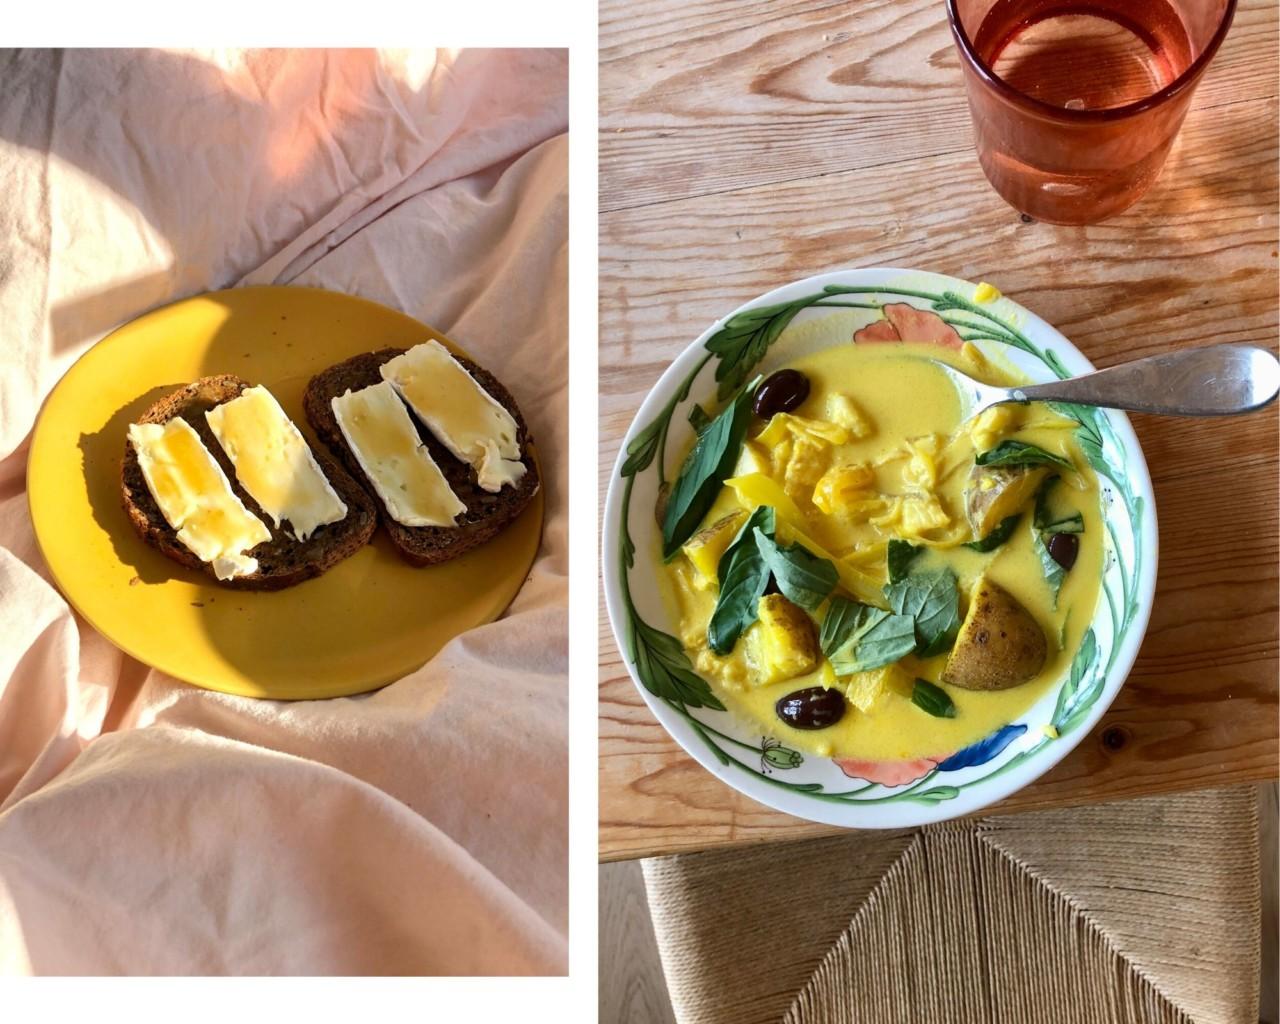 gul-fiskegryte-brie-tallerken-safran-frokost-pa-senga